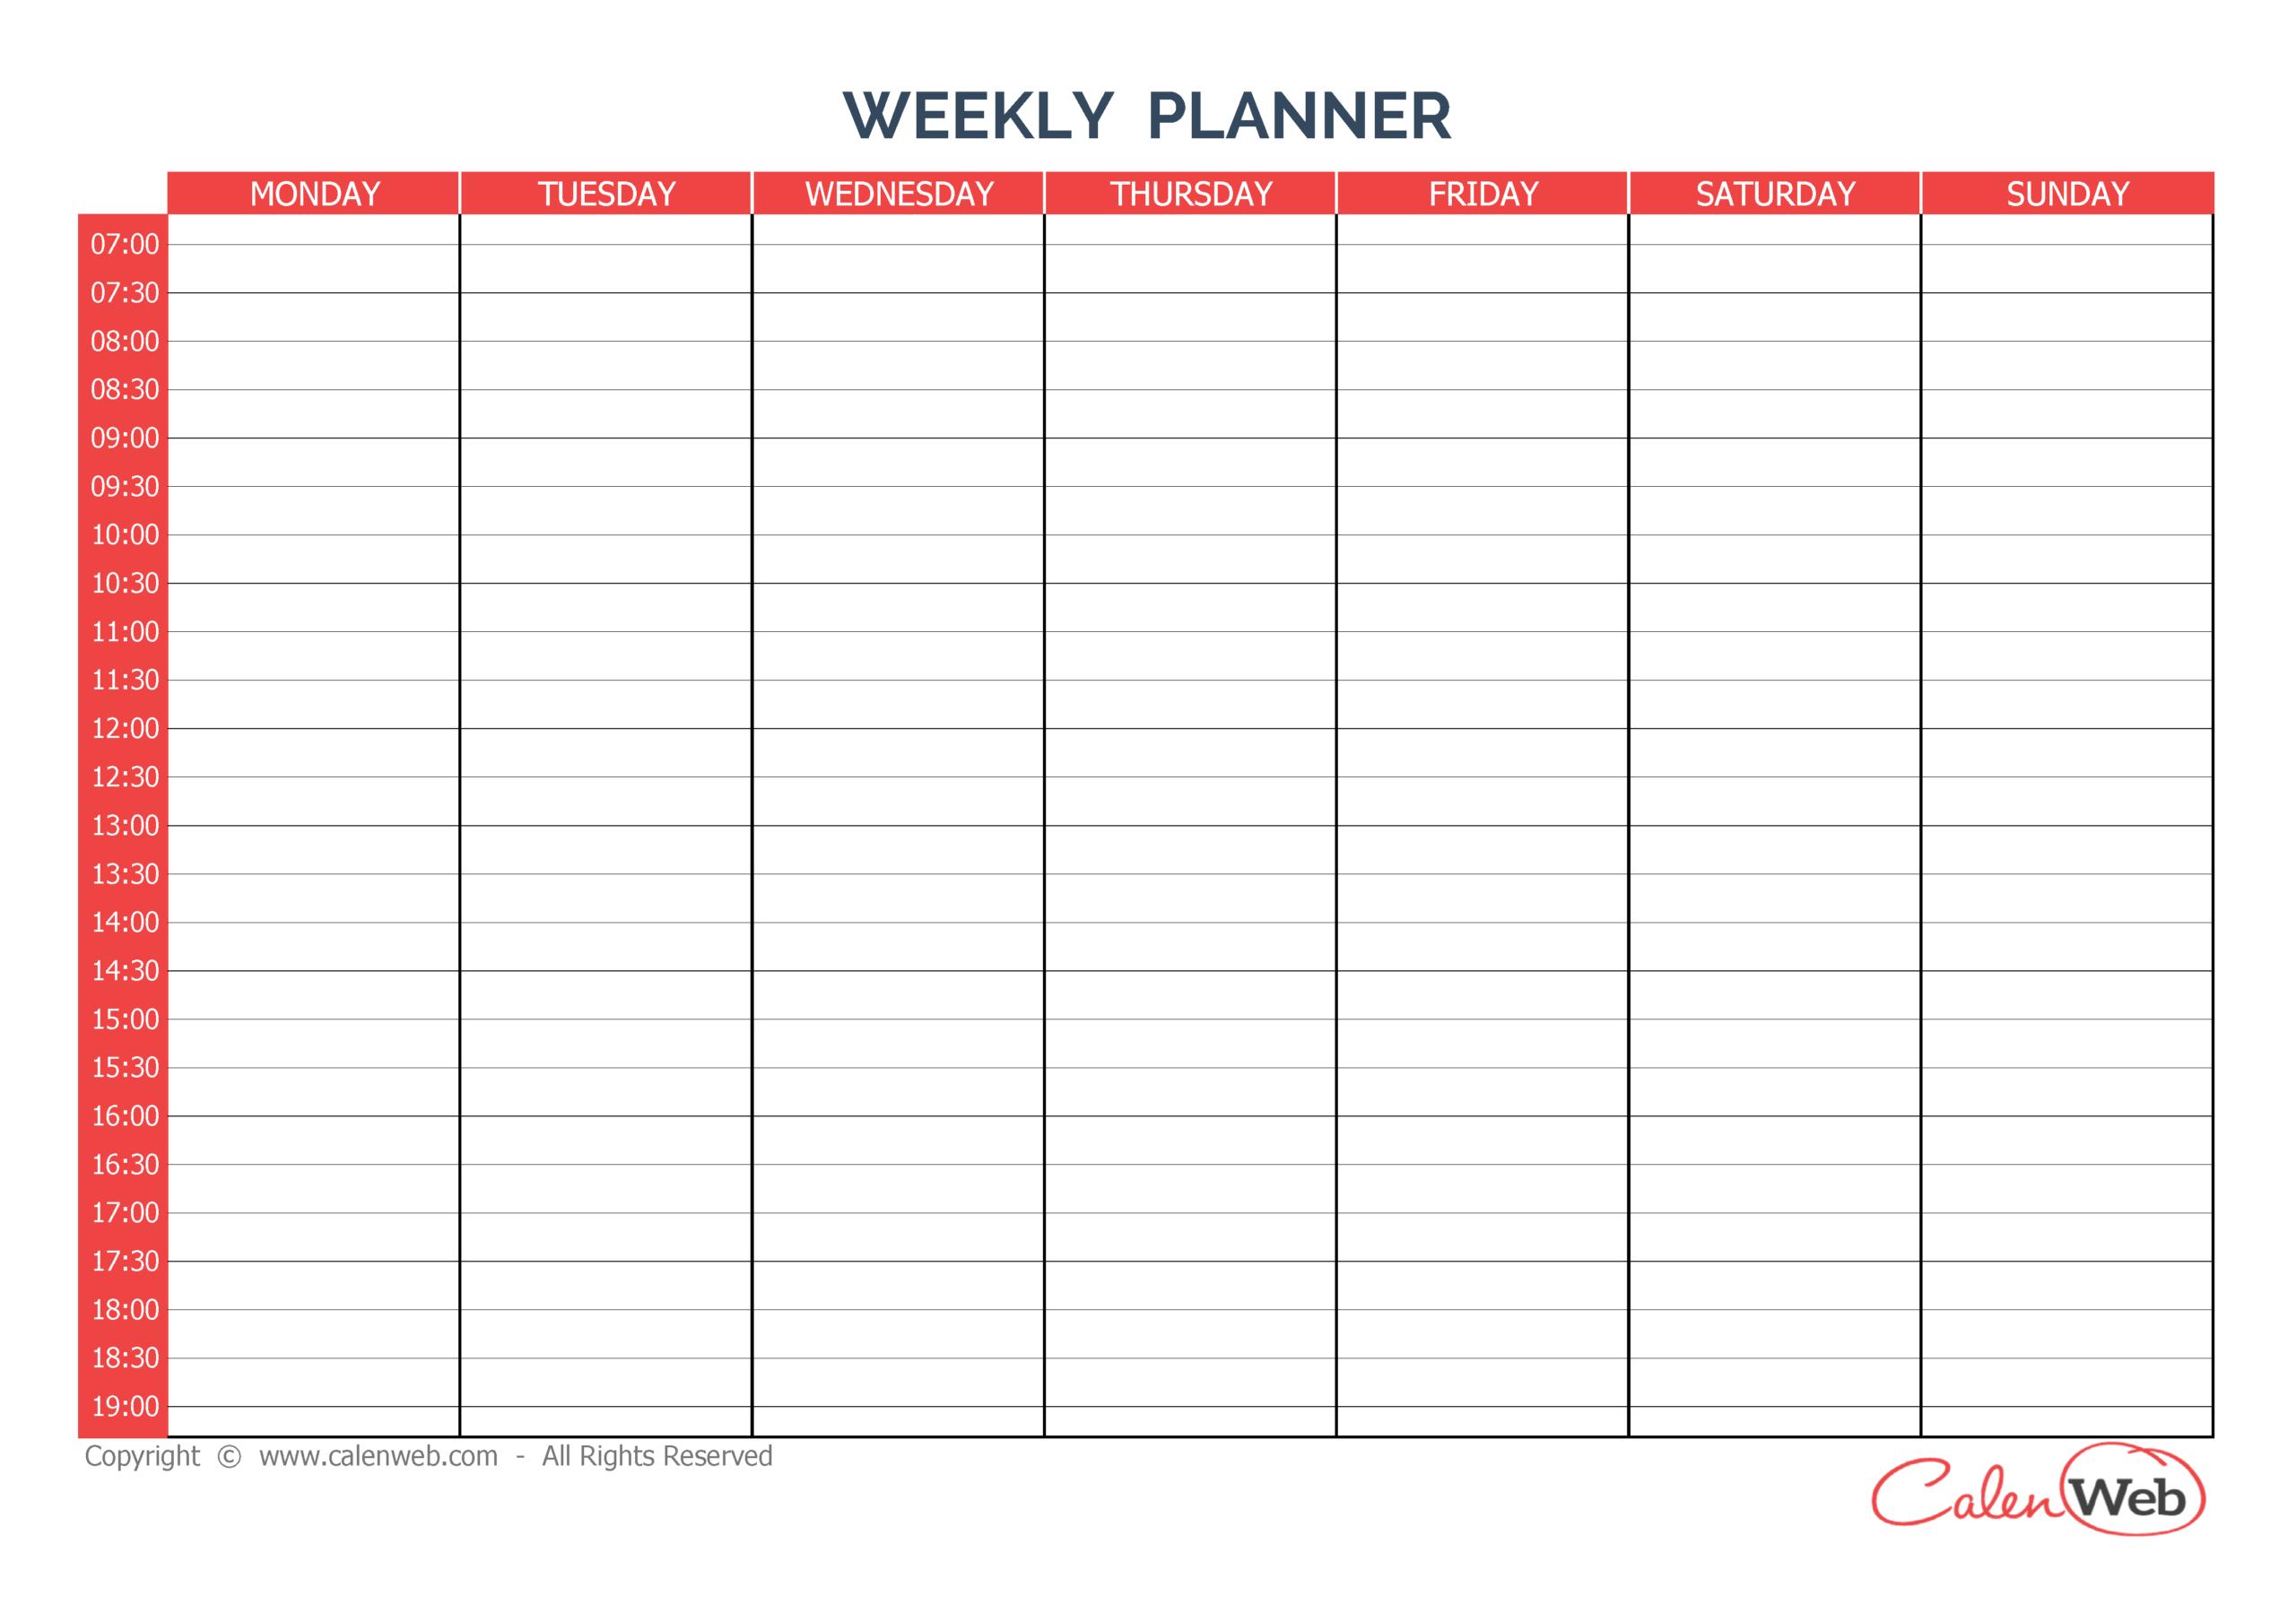 Free Printable 7 Day Weekly Calendar   Calendar Printables